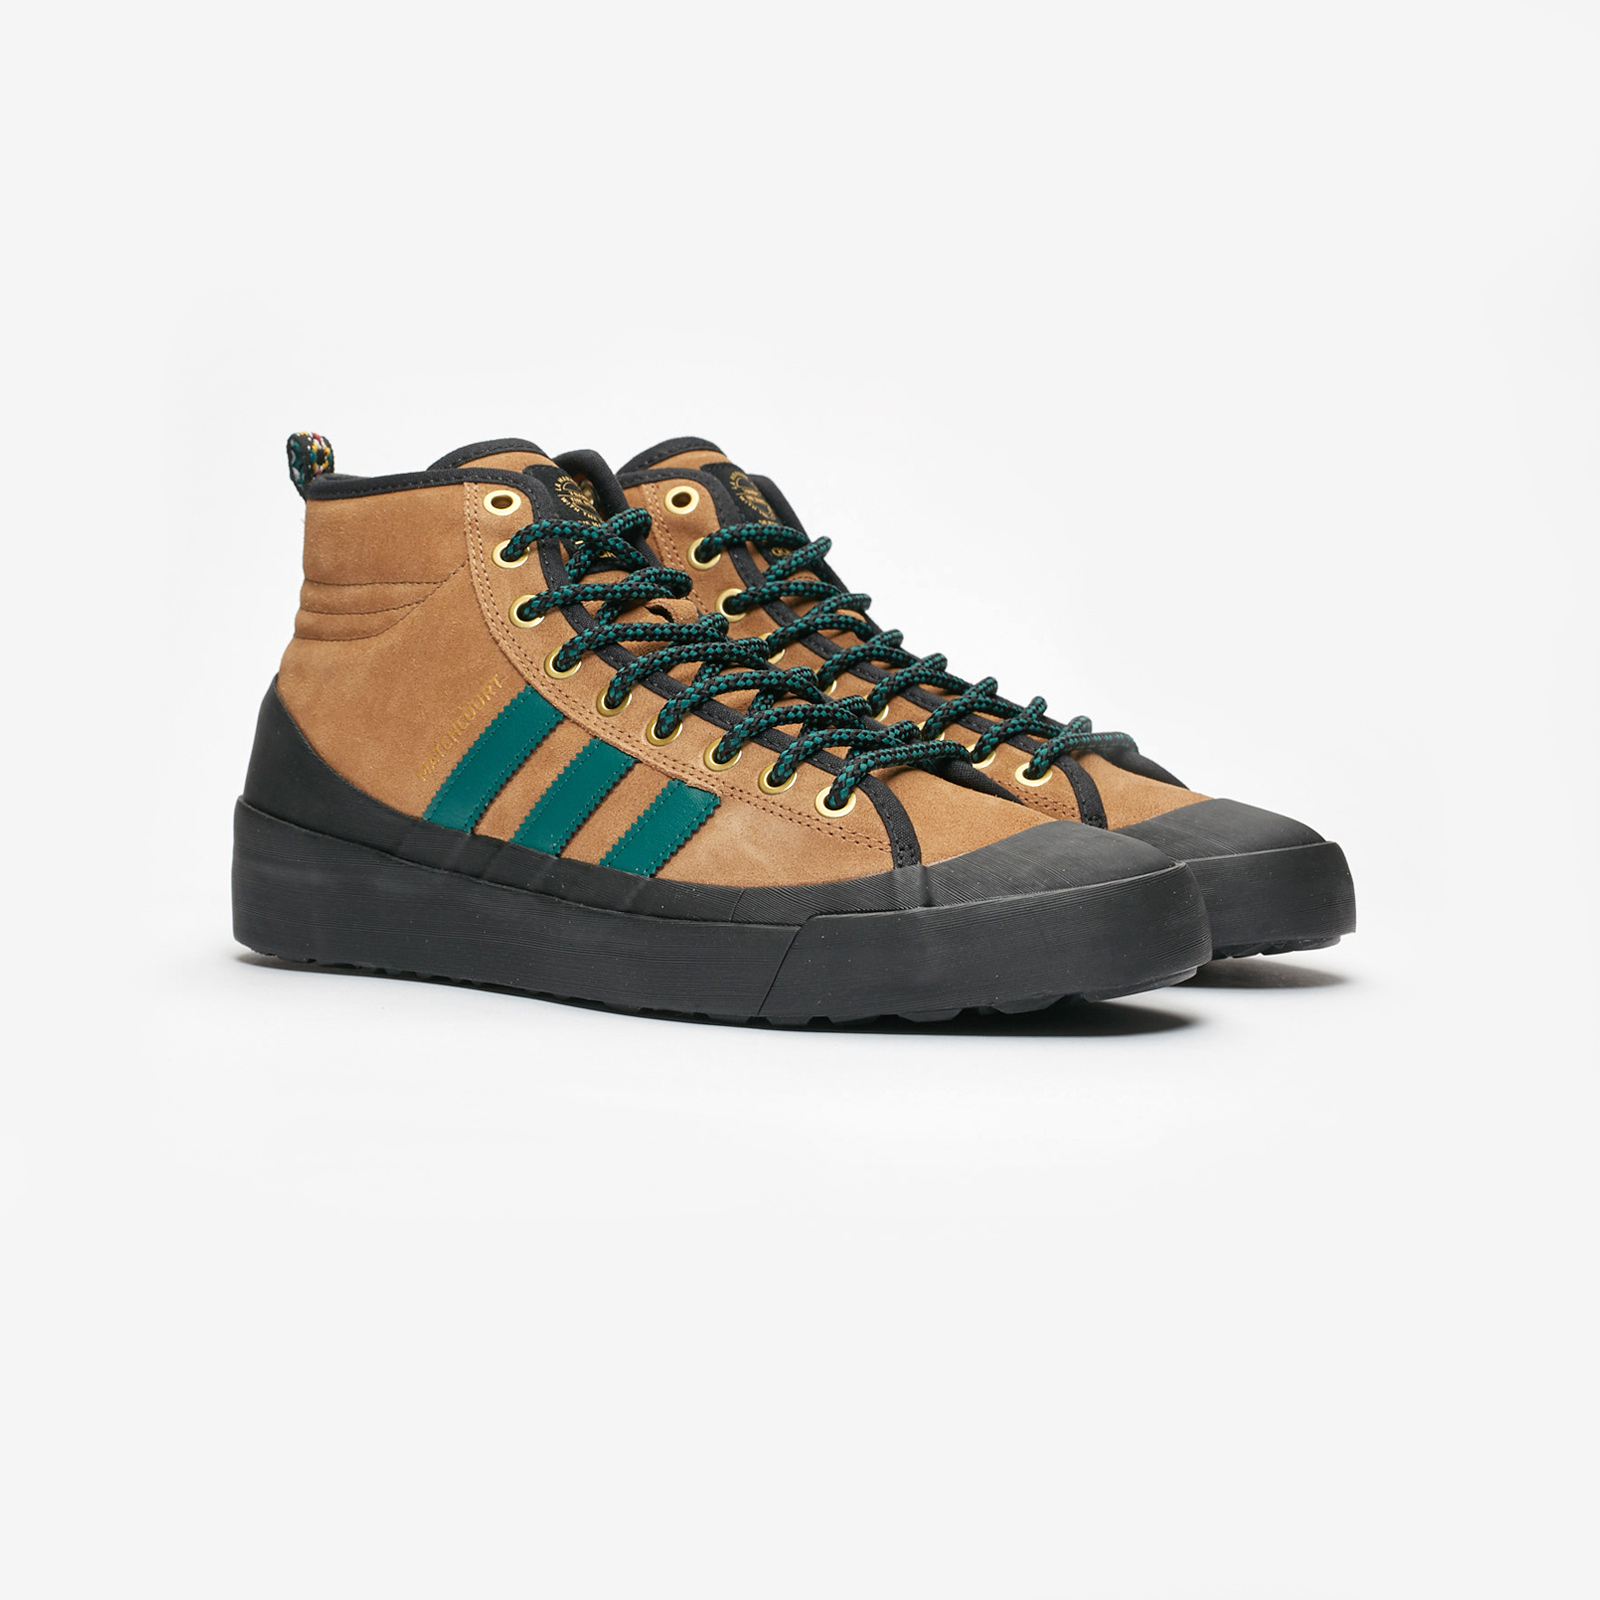 Matchcourt Sneakersnstuff Adidas Rx3 Sneakers B27962 High I IEW2HD9